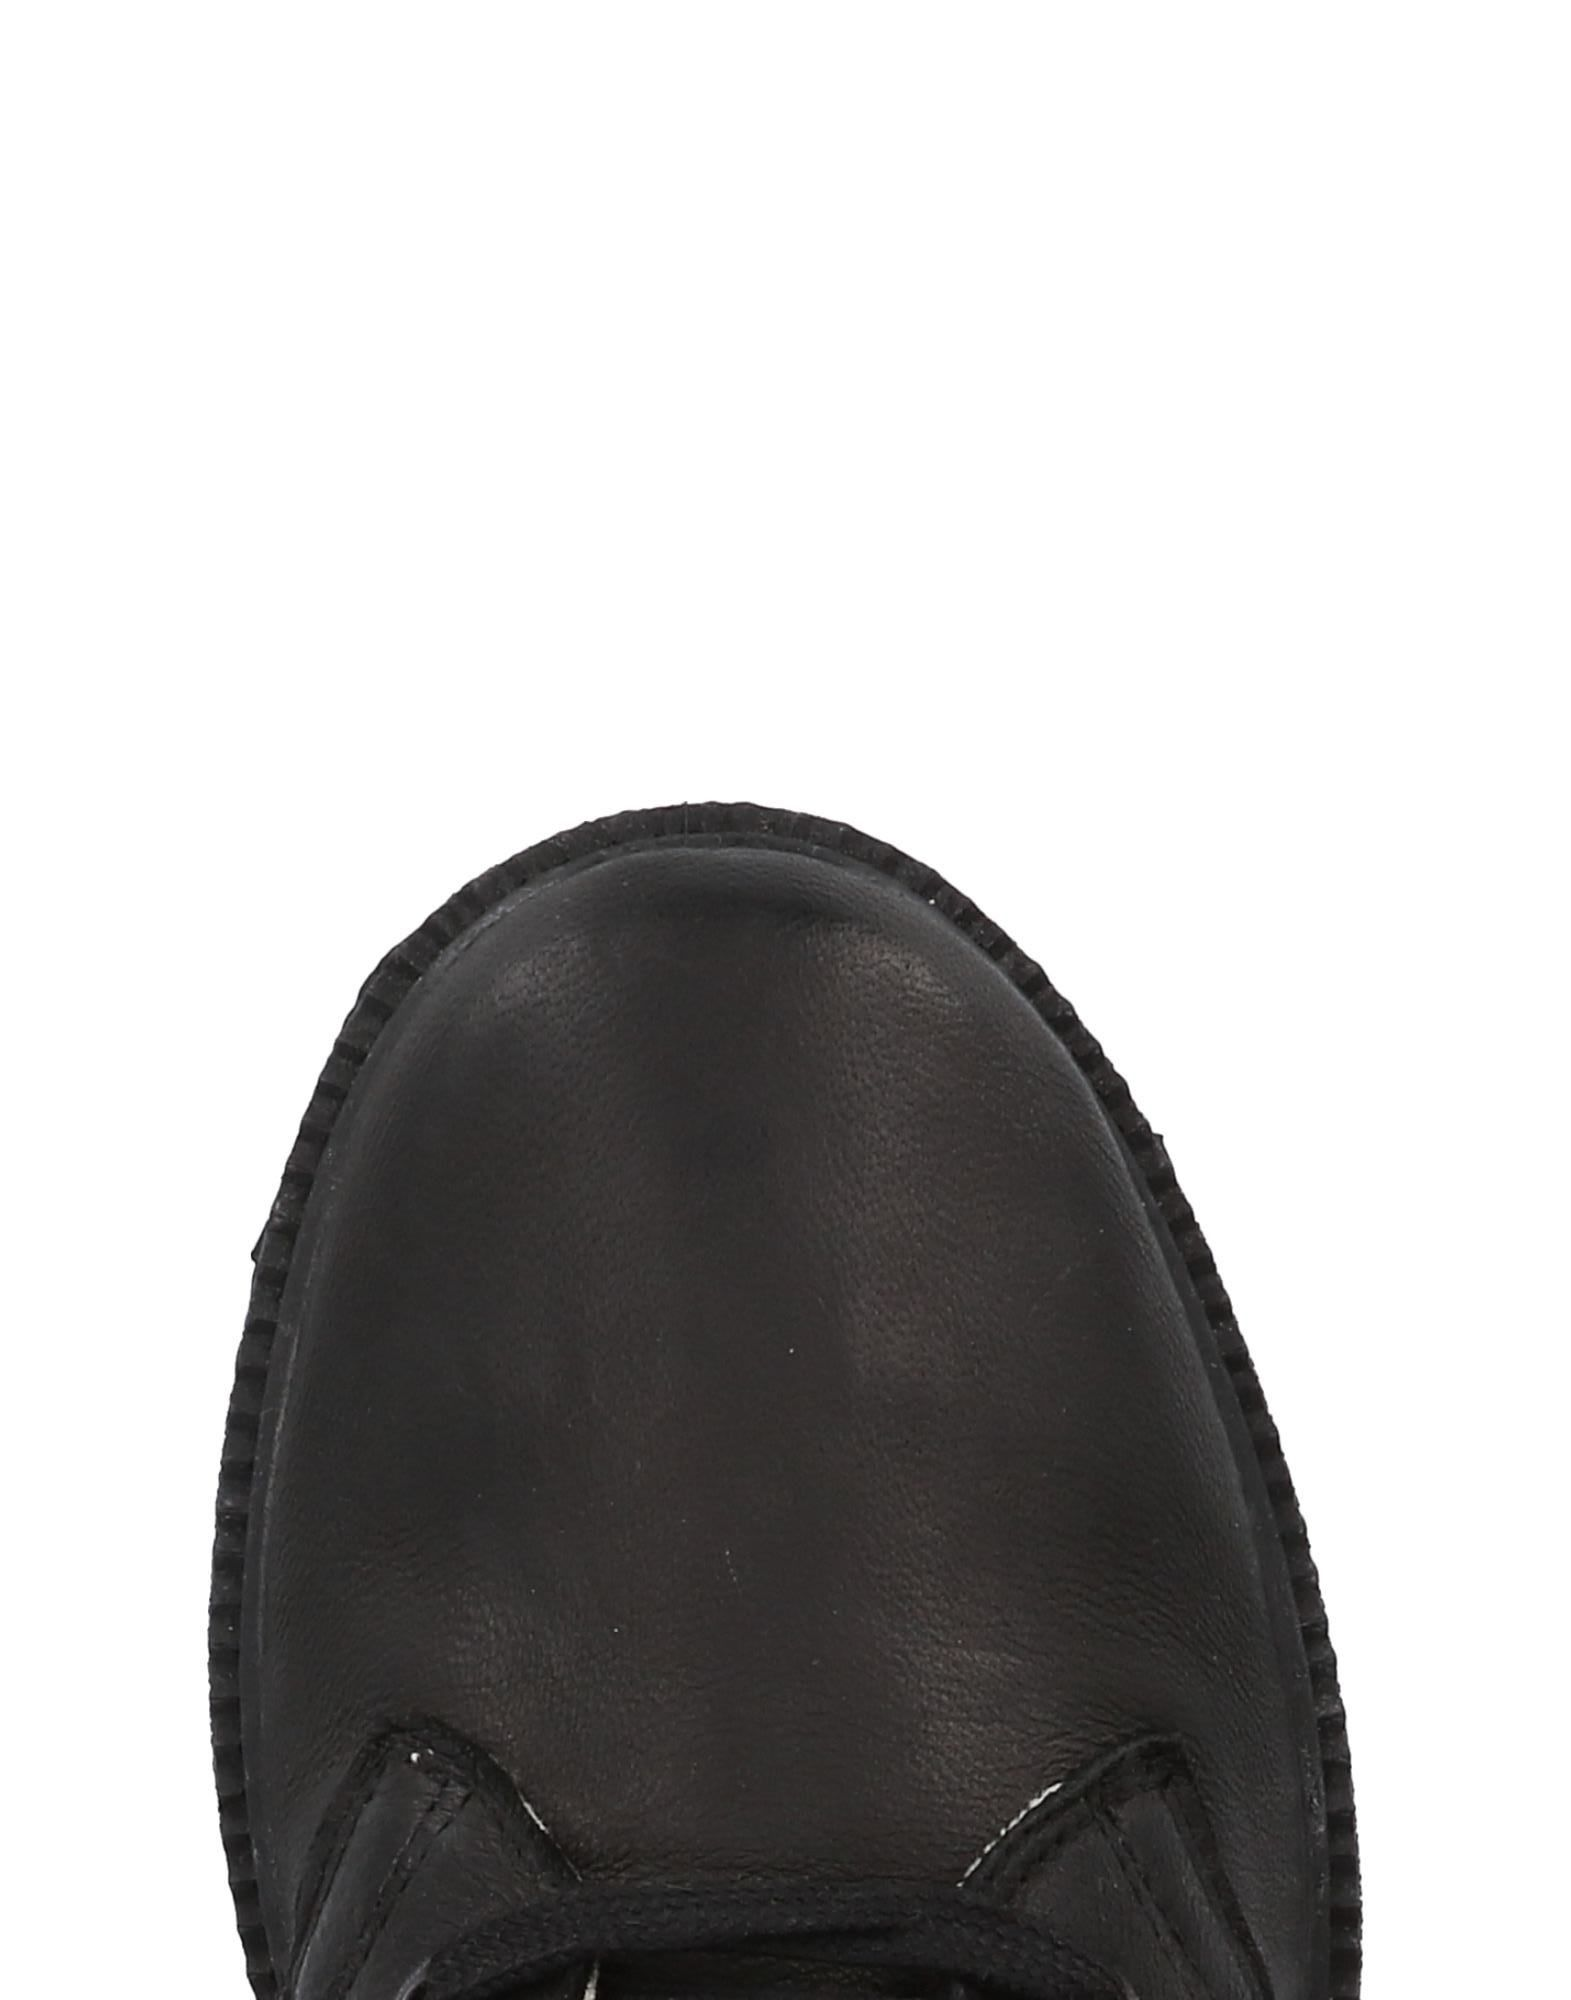 Rabatt echte Schuhe 11465974LT Springa Stiefelette Herren 11465974LT Schuhe 29e9d7